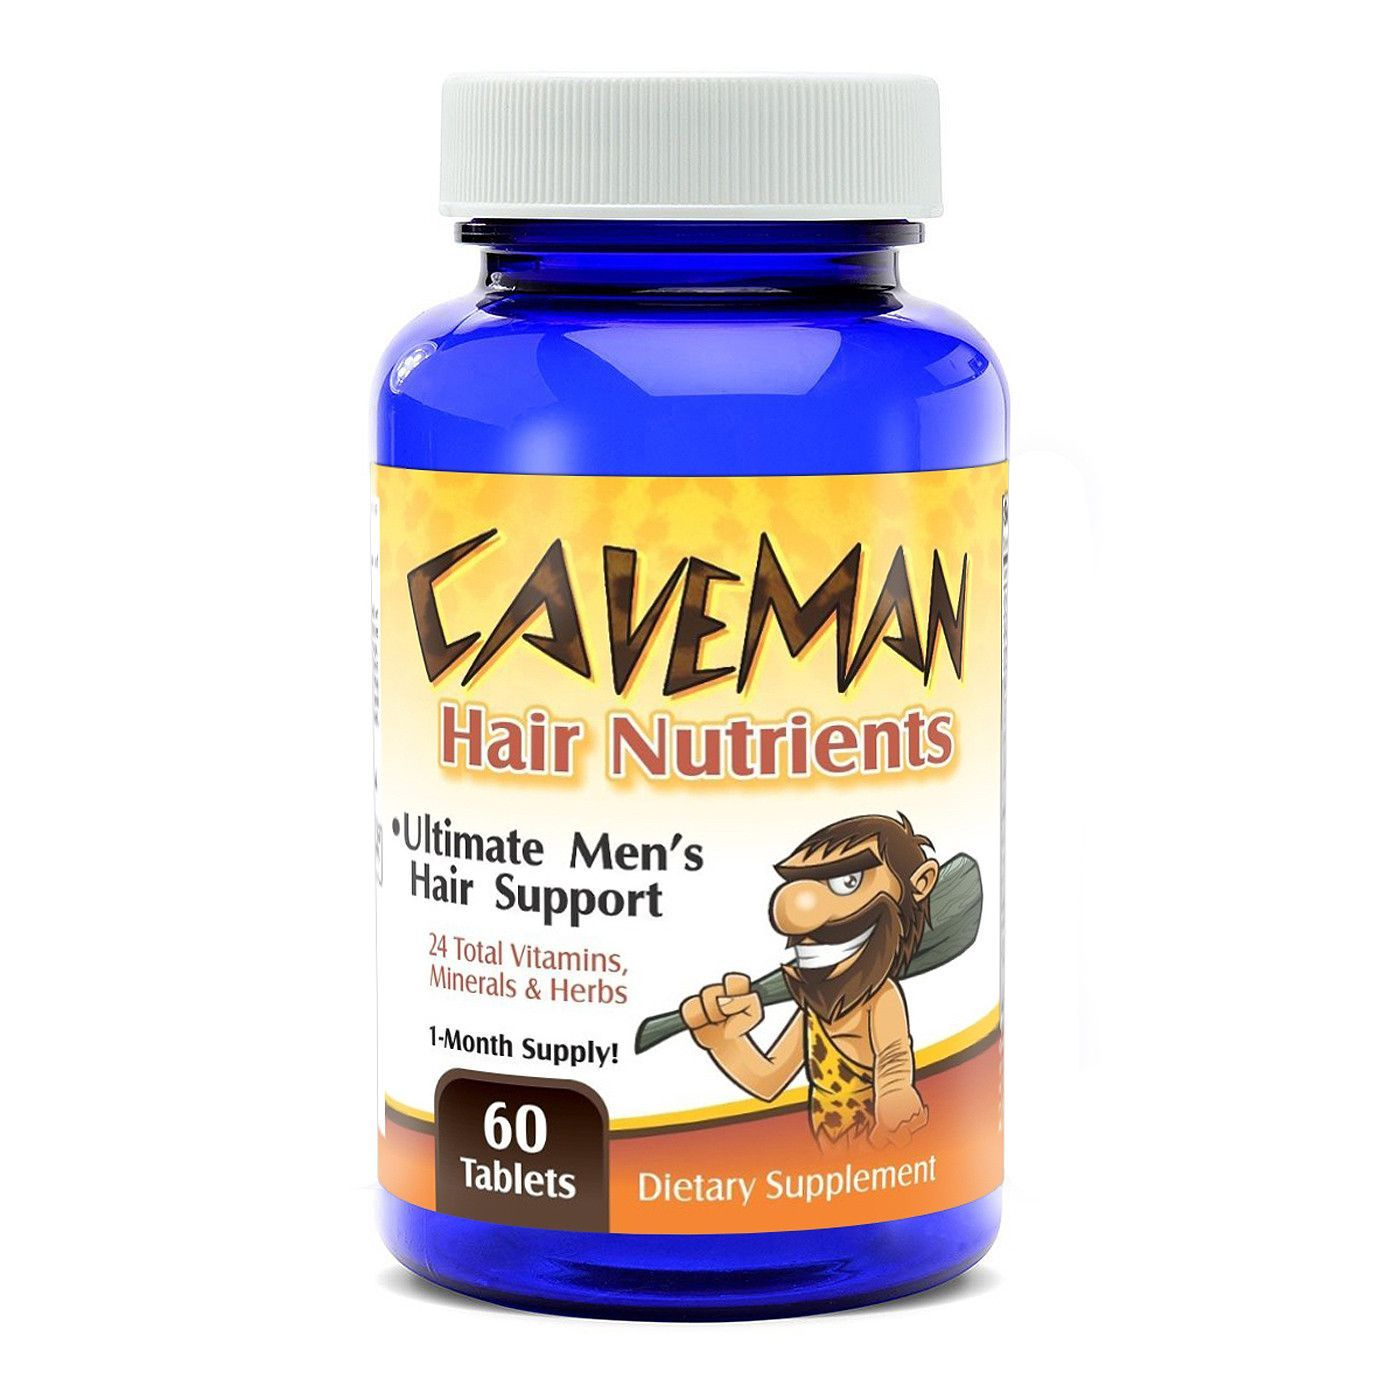 Caveman Hair Nutrients Menus Hair u Beard Growth Vitamins